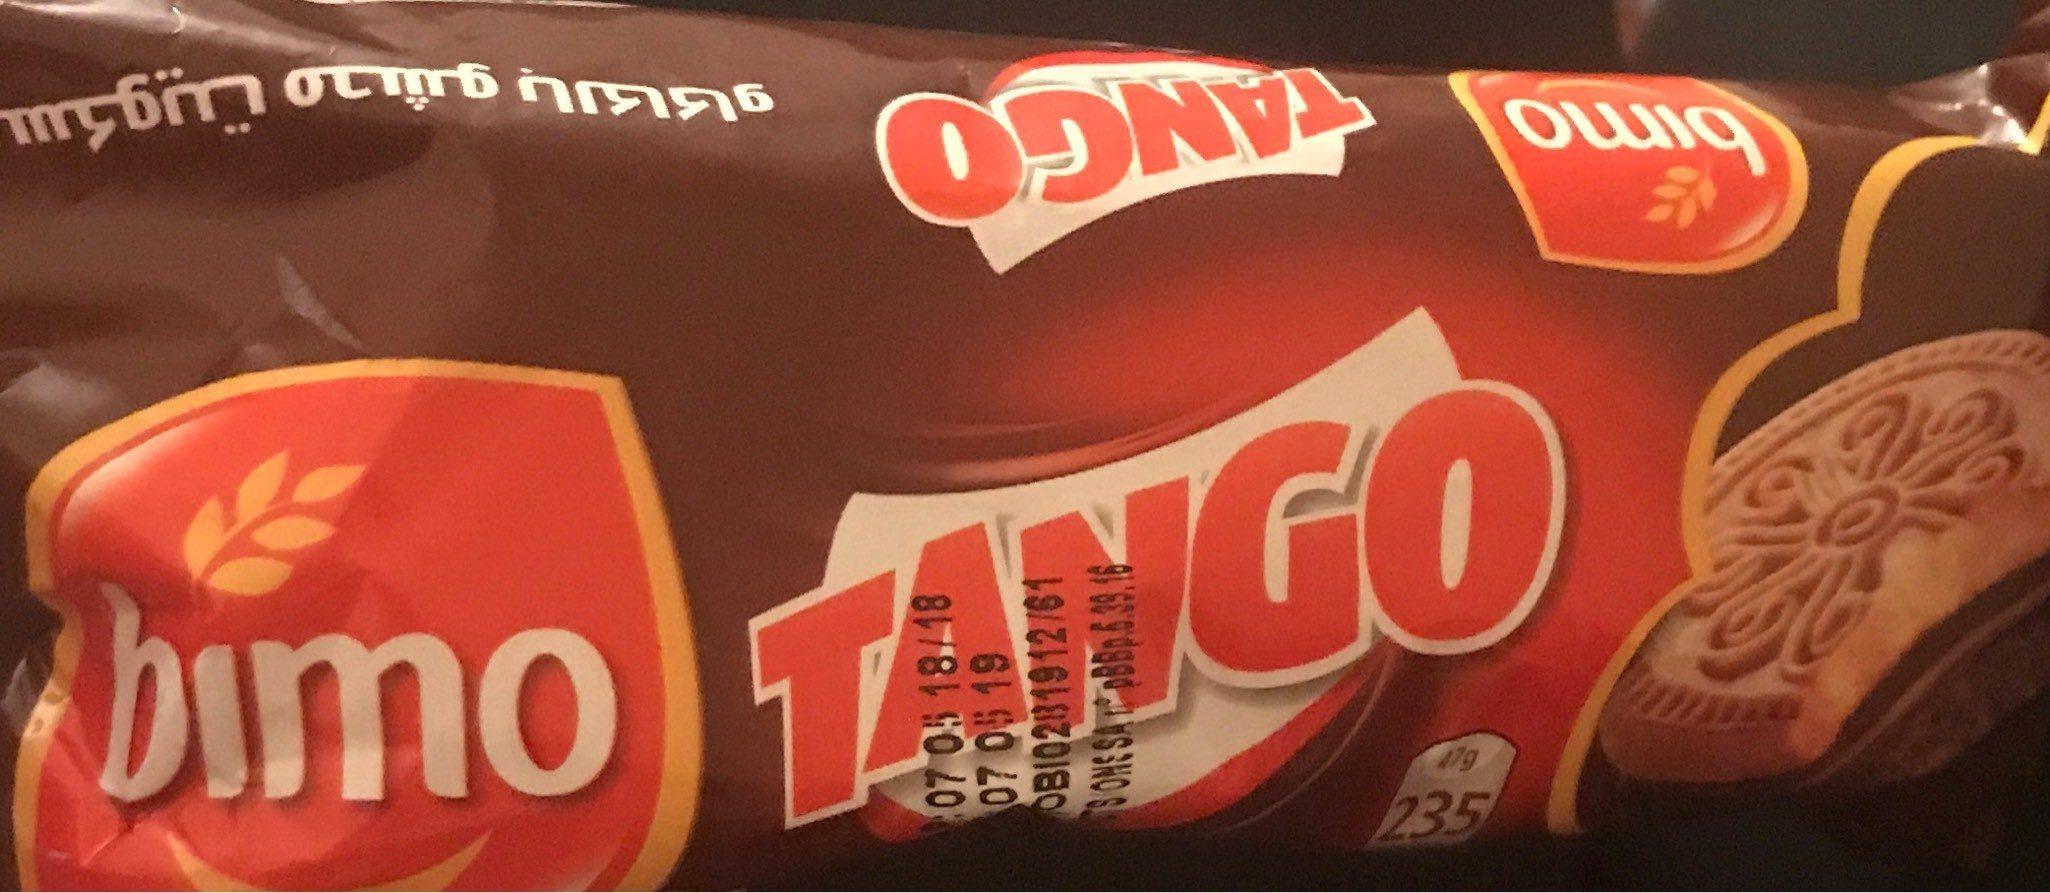 Tango - Product - fr